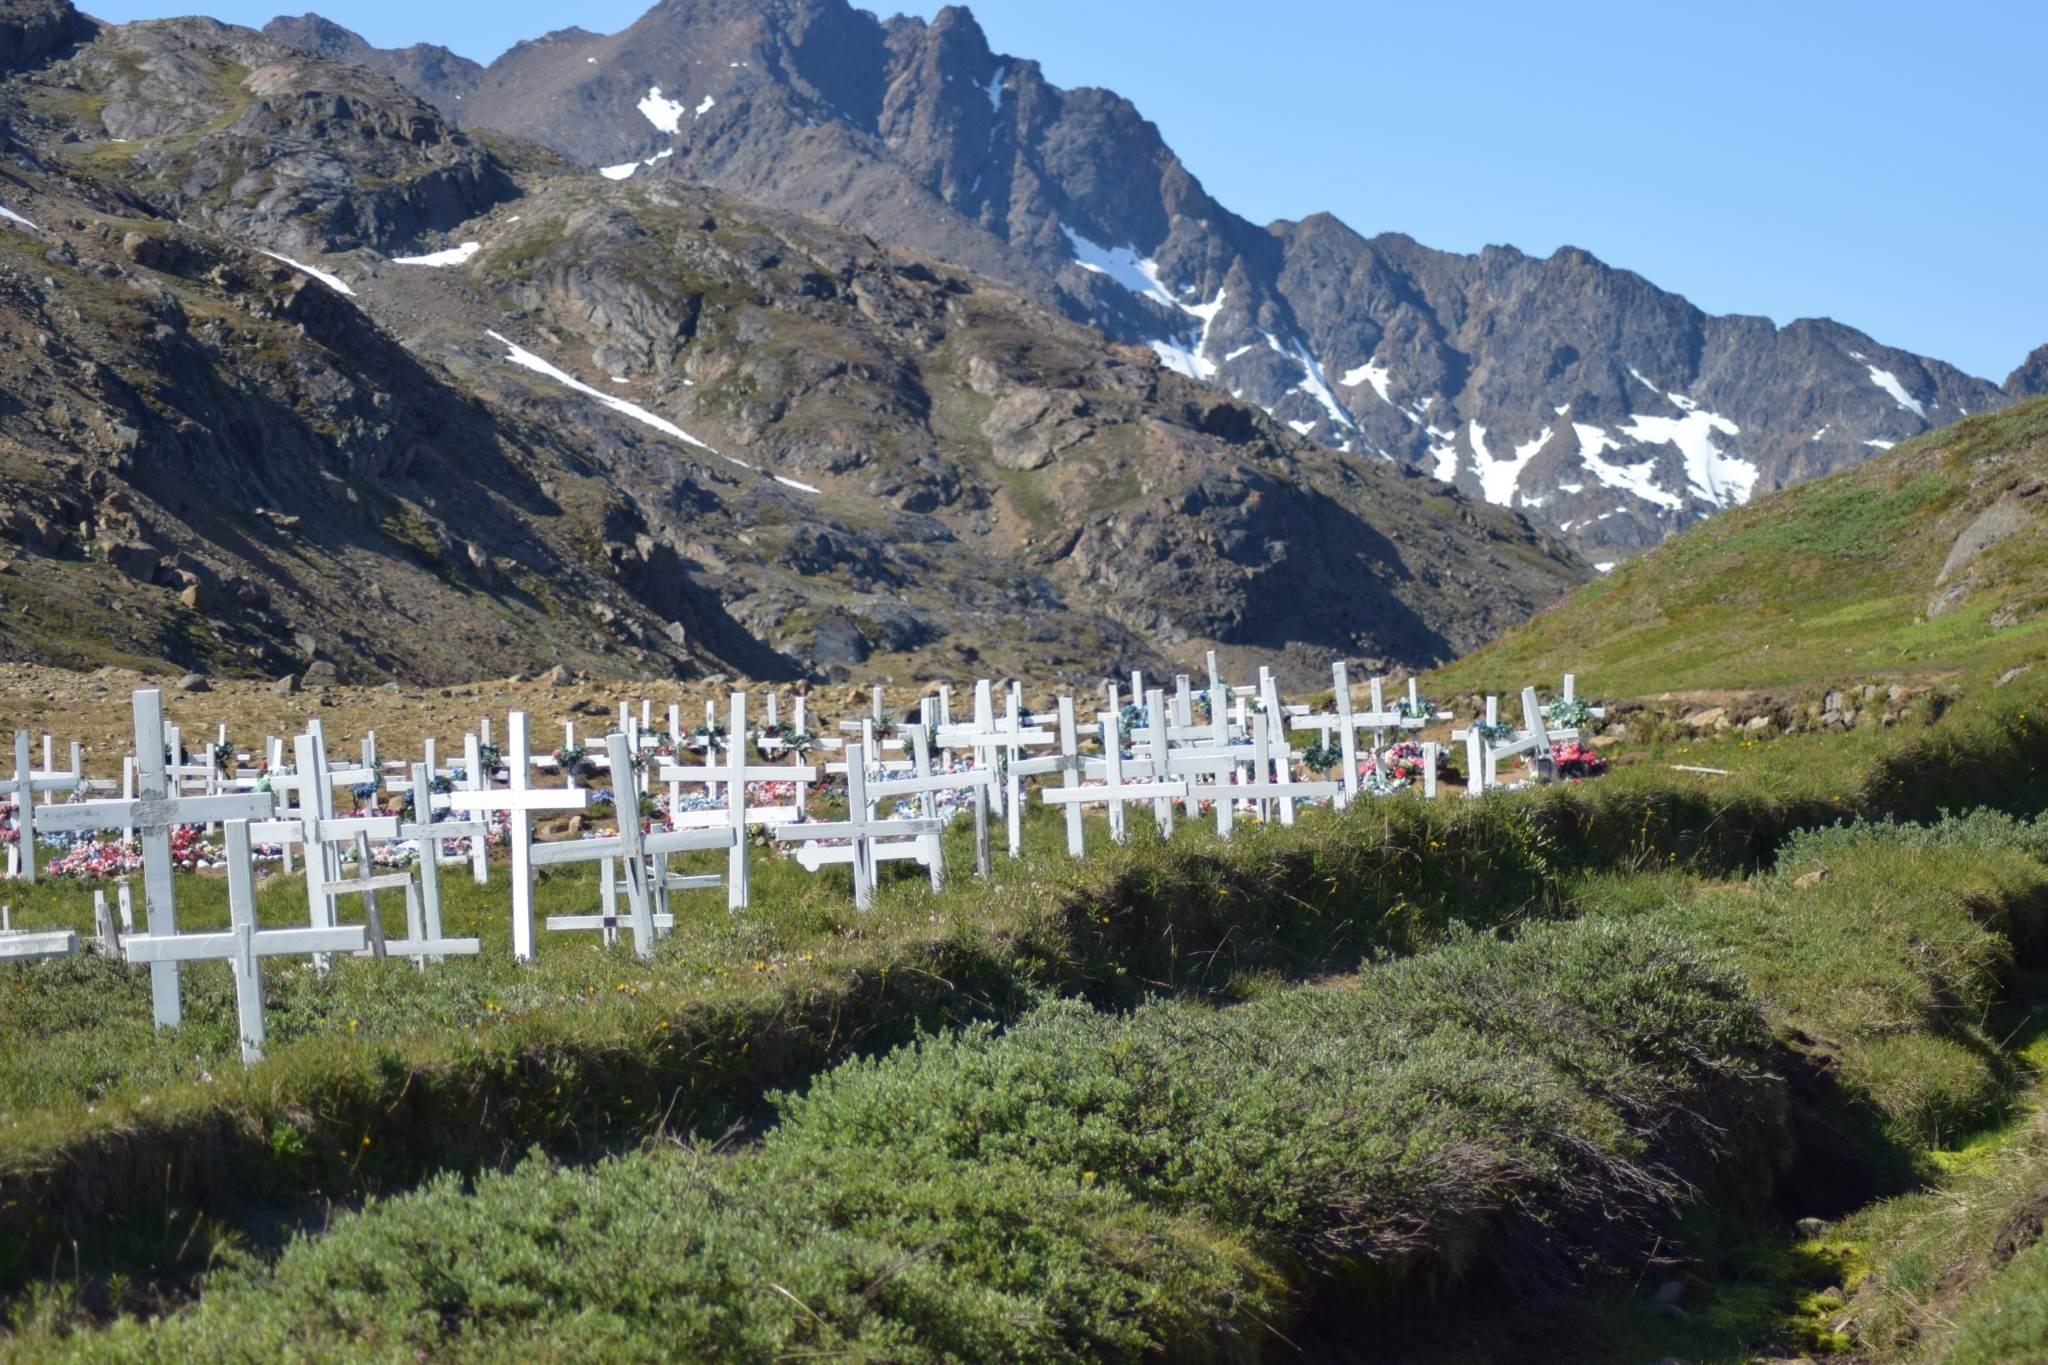 Graveyard in Tasiilaq